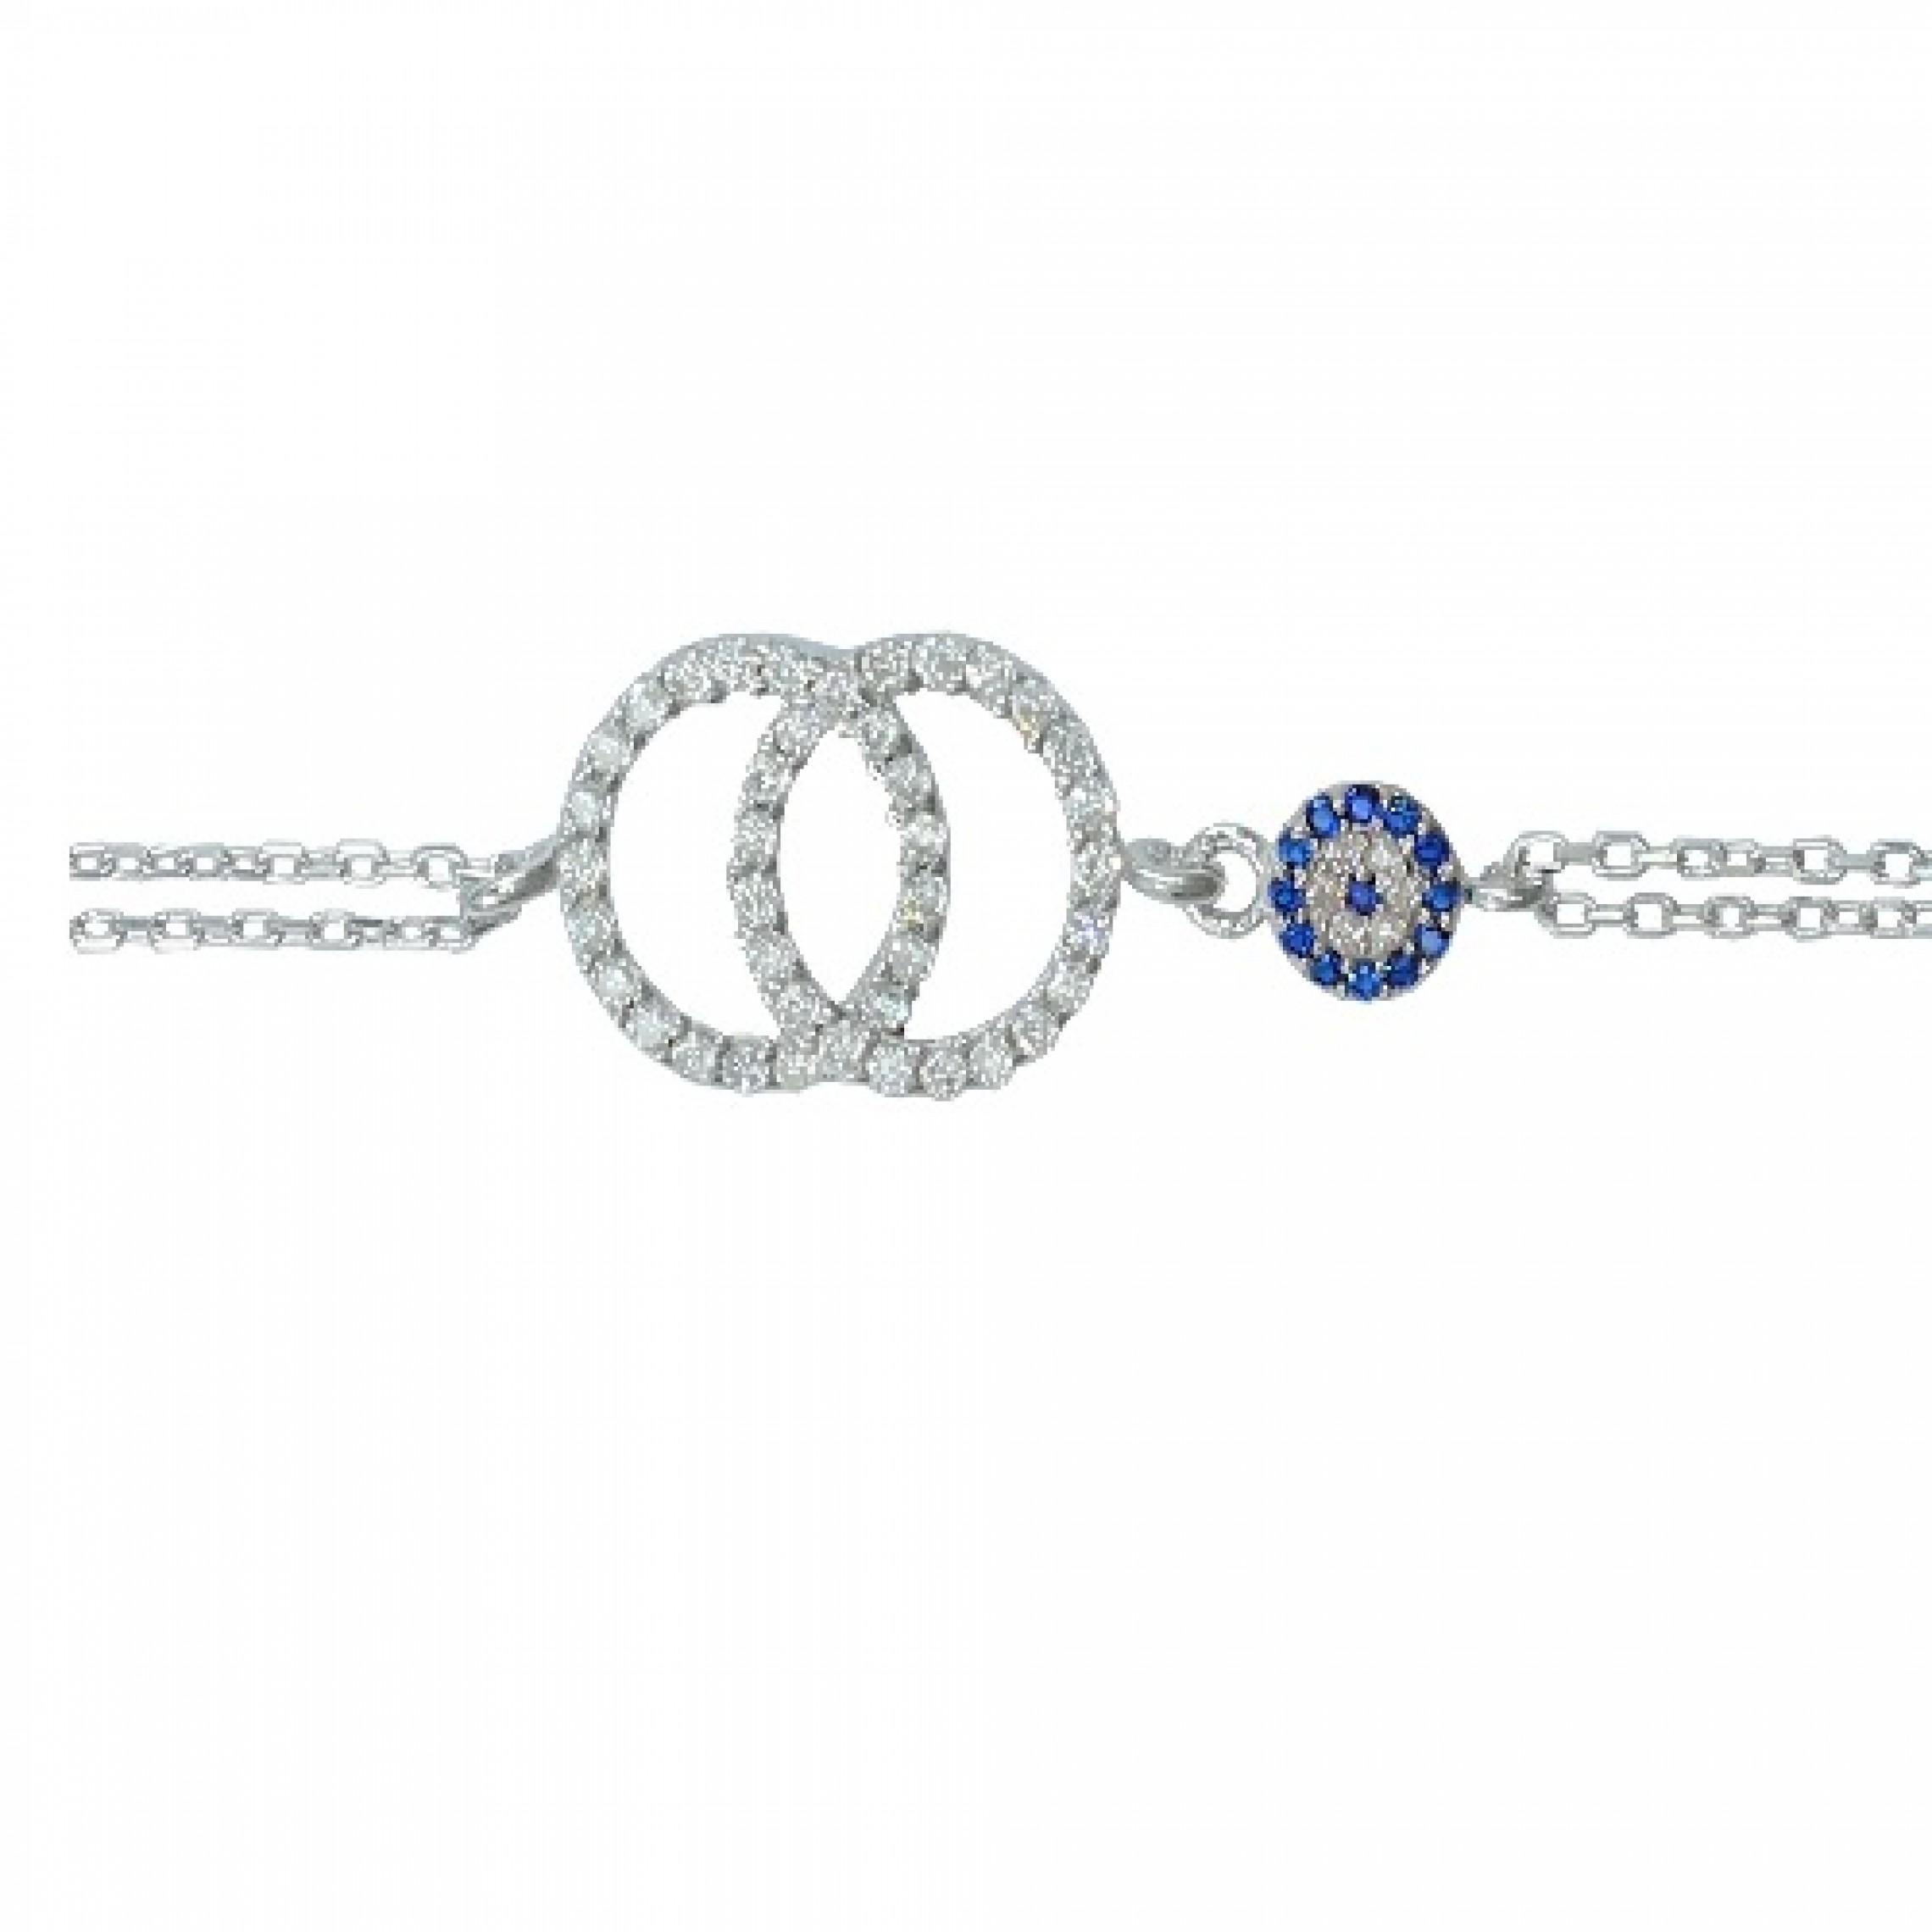 SB-119 Evil Eye 925 Sterling Silver CZ Bracelet